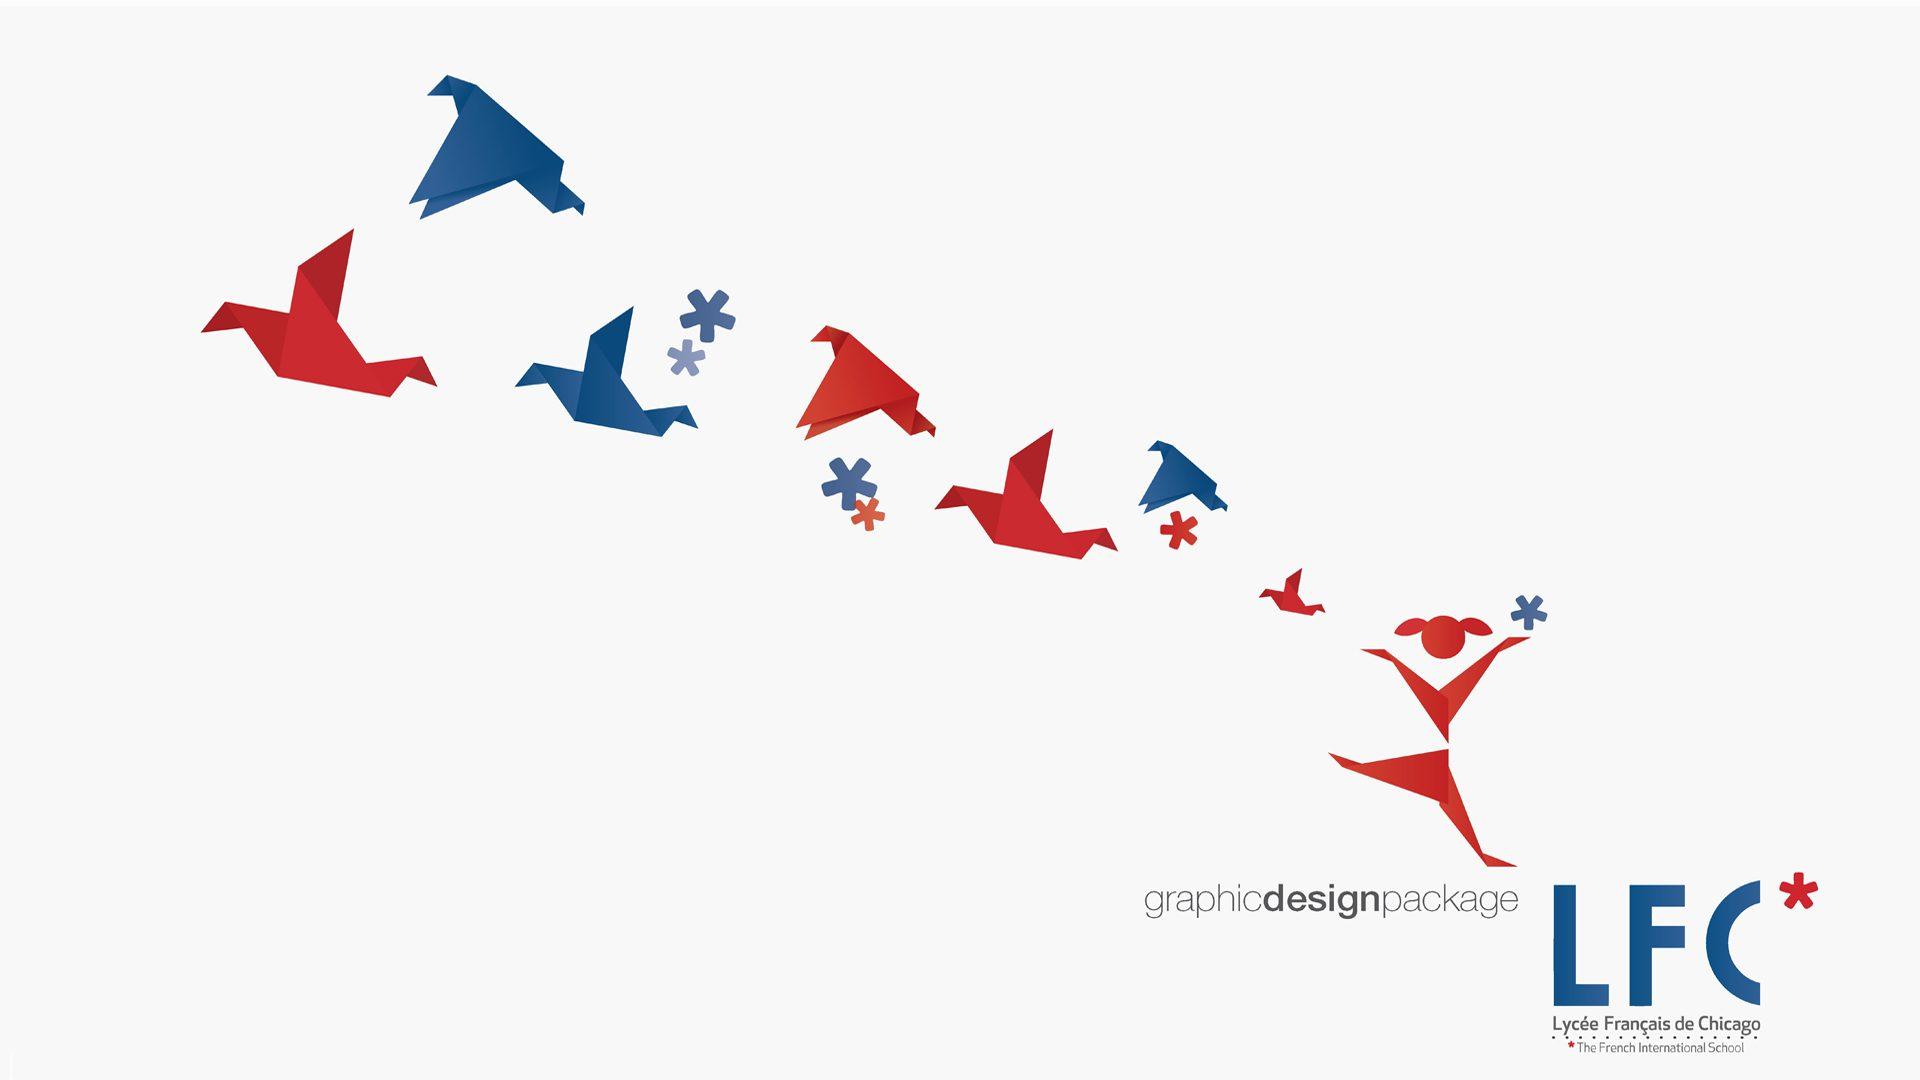 01-LFC_GraphicDesign_01